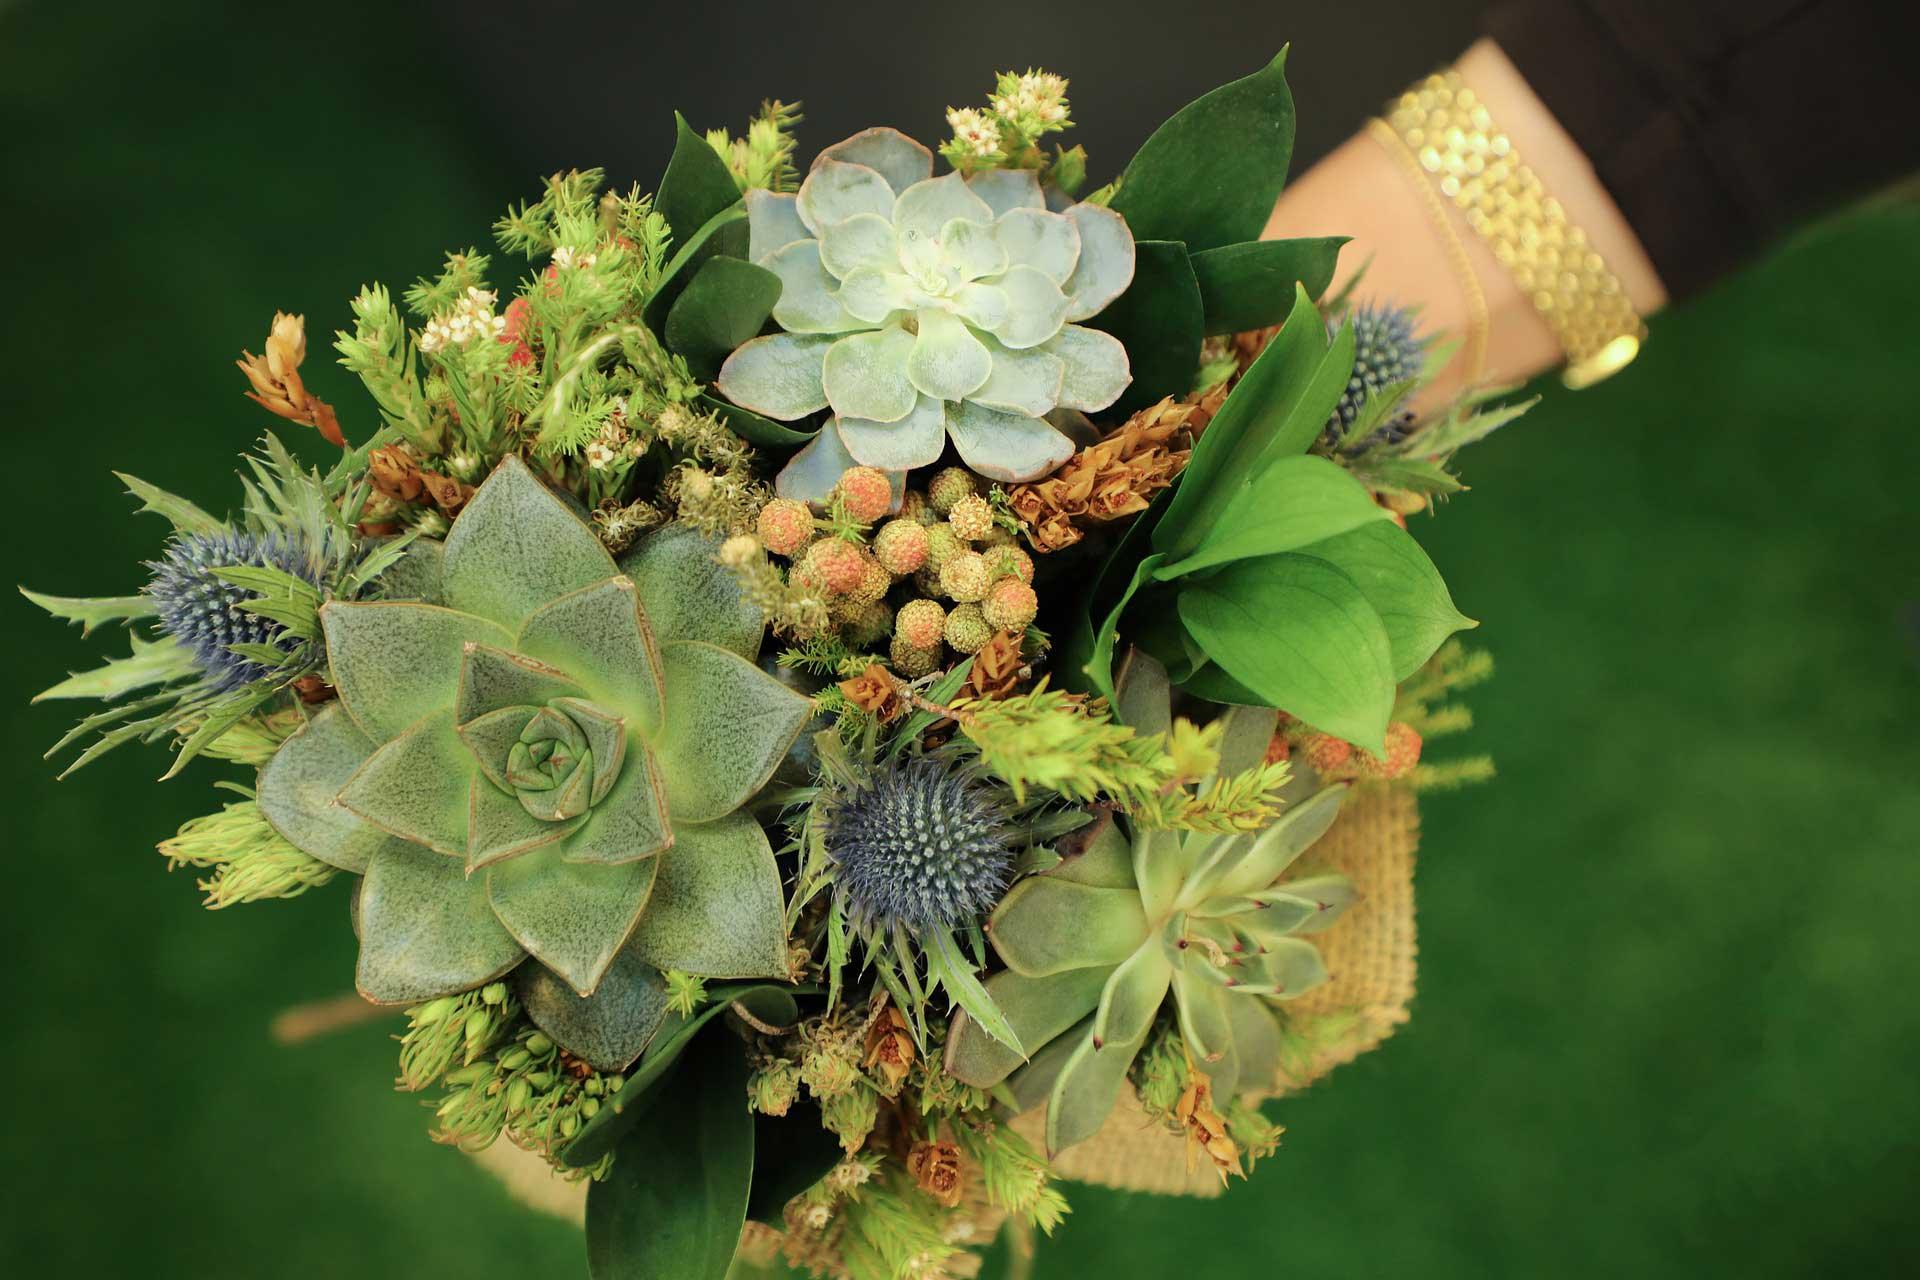 Succulent Garden - Anti-Anxiety Geometric Patterns